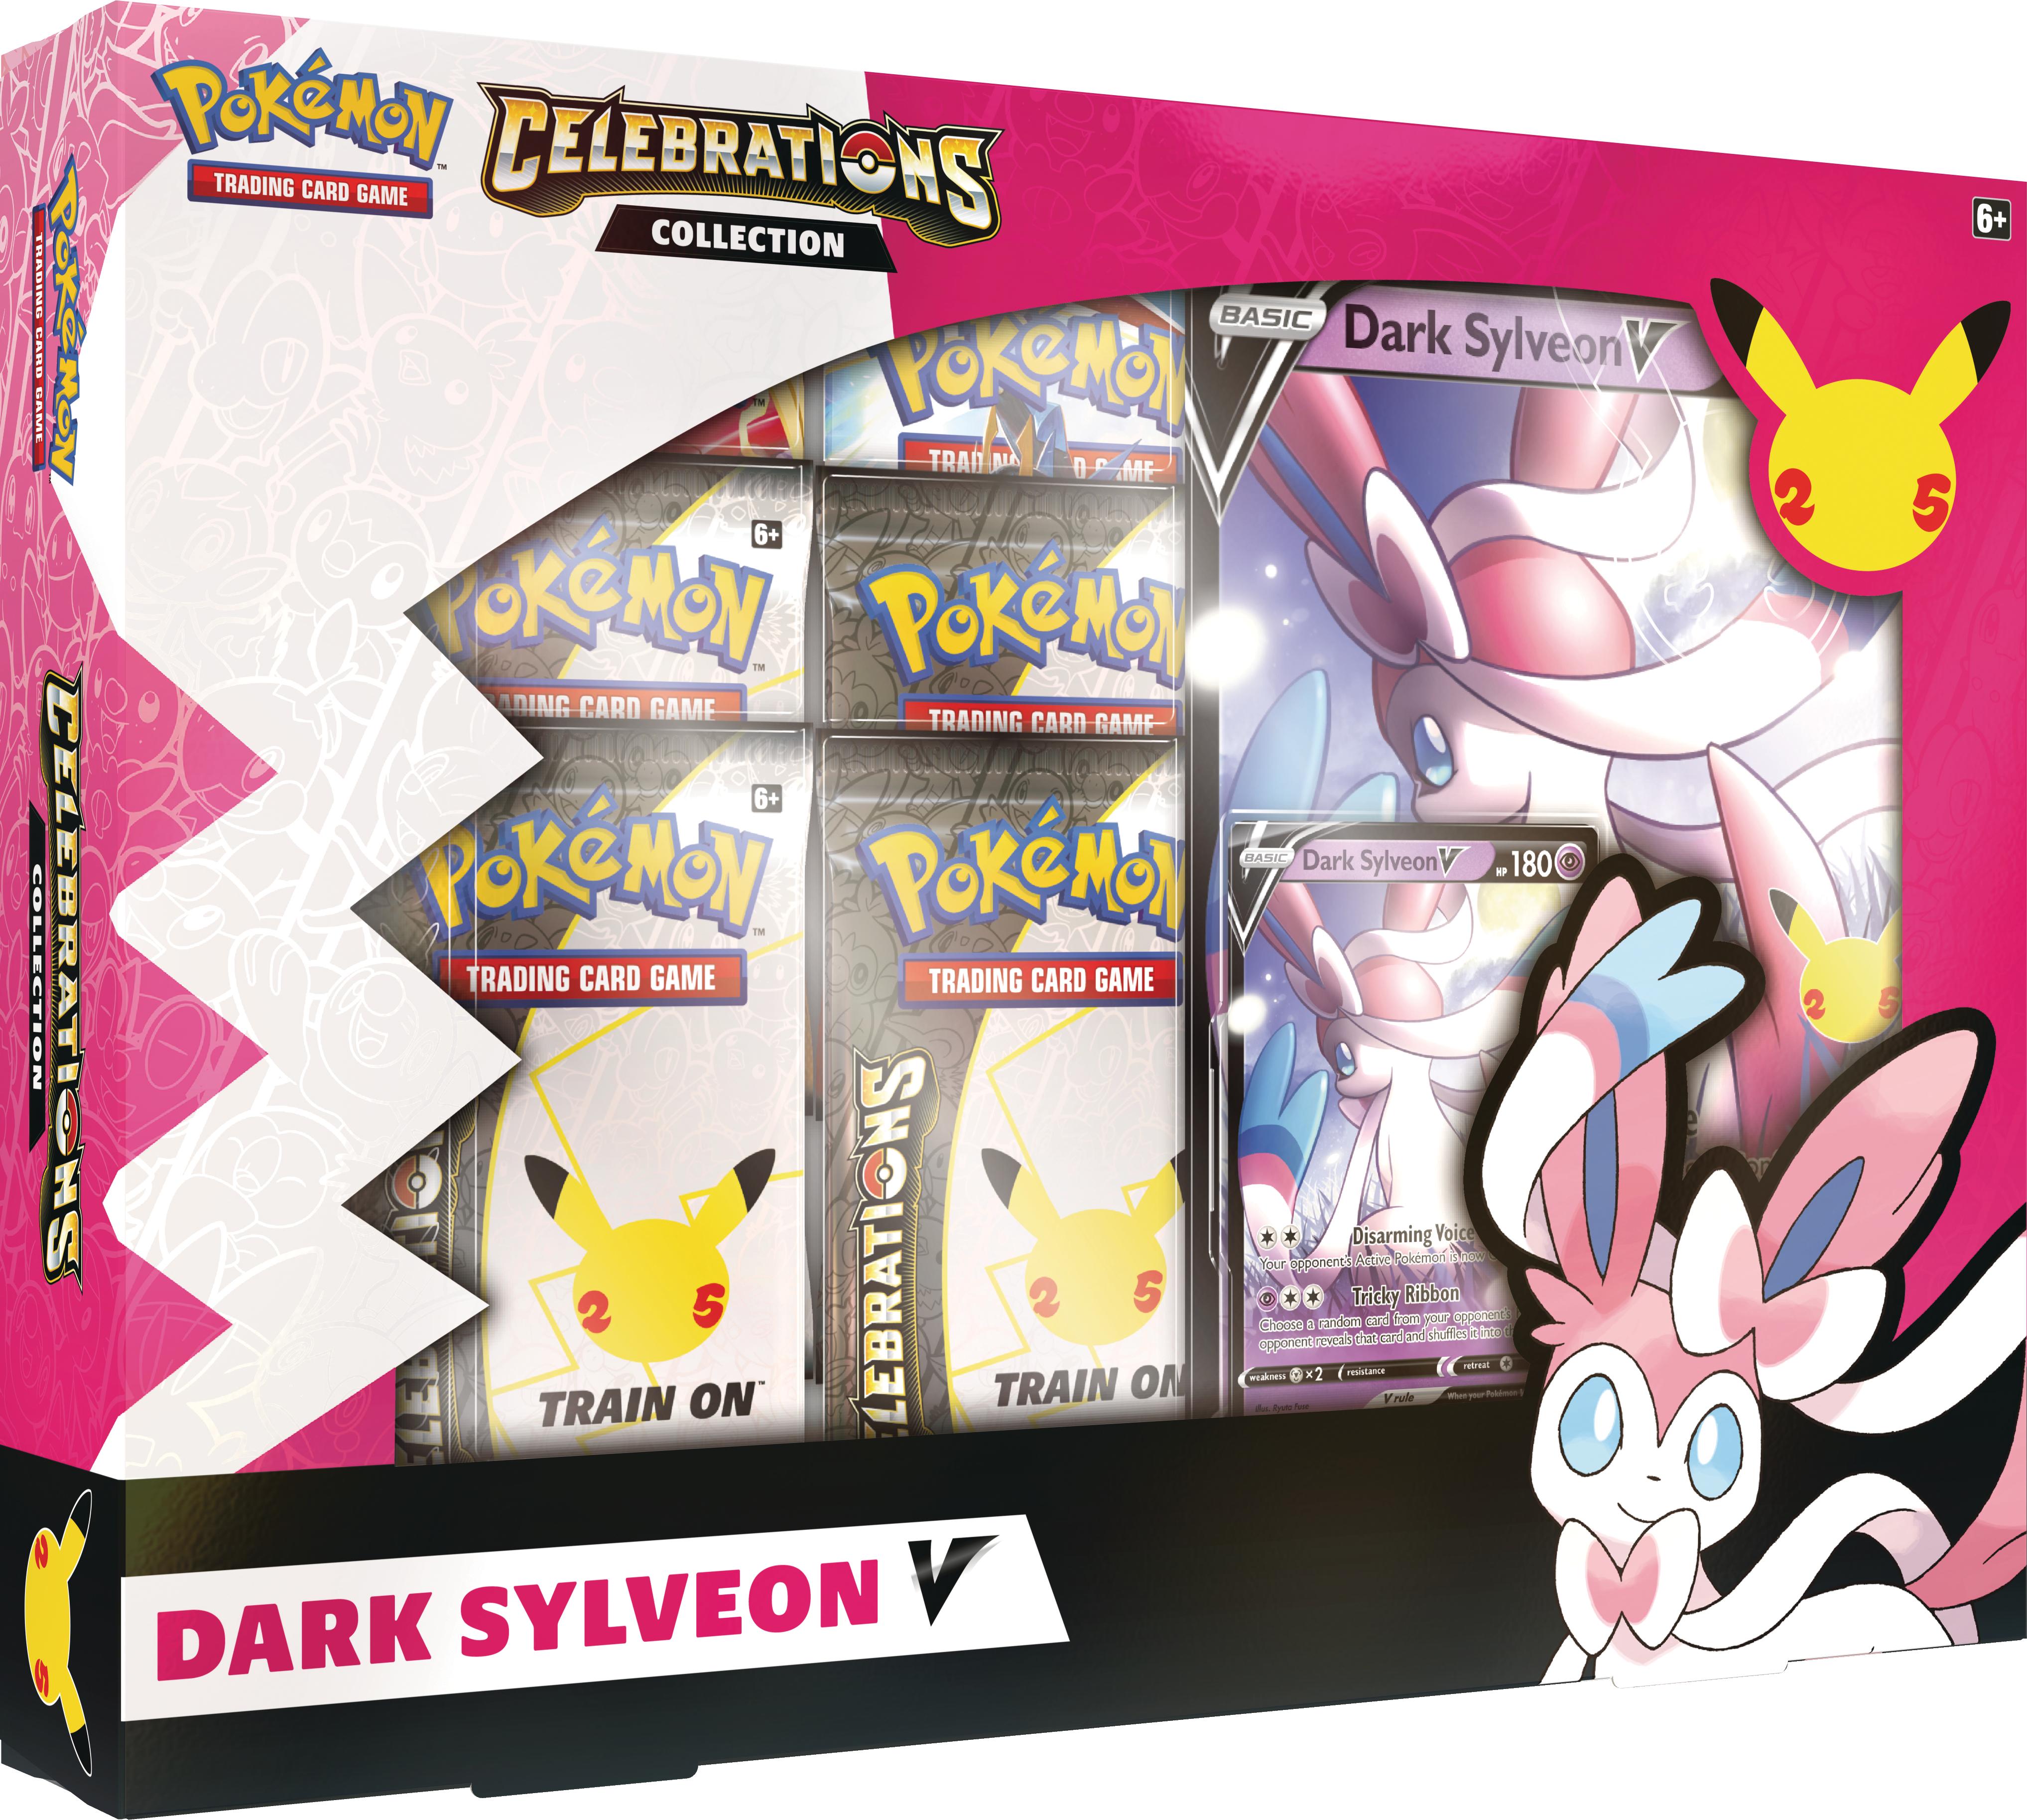 Celebrations Collection - Dark Sylveon